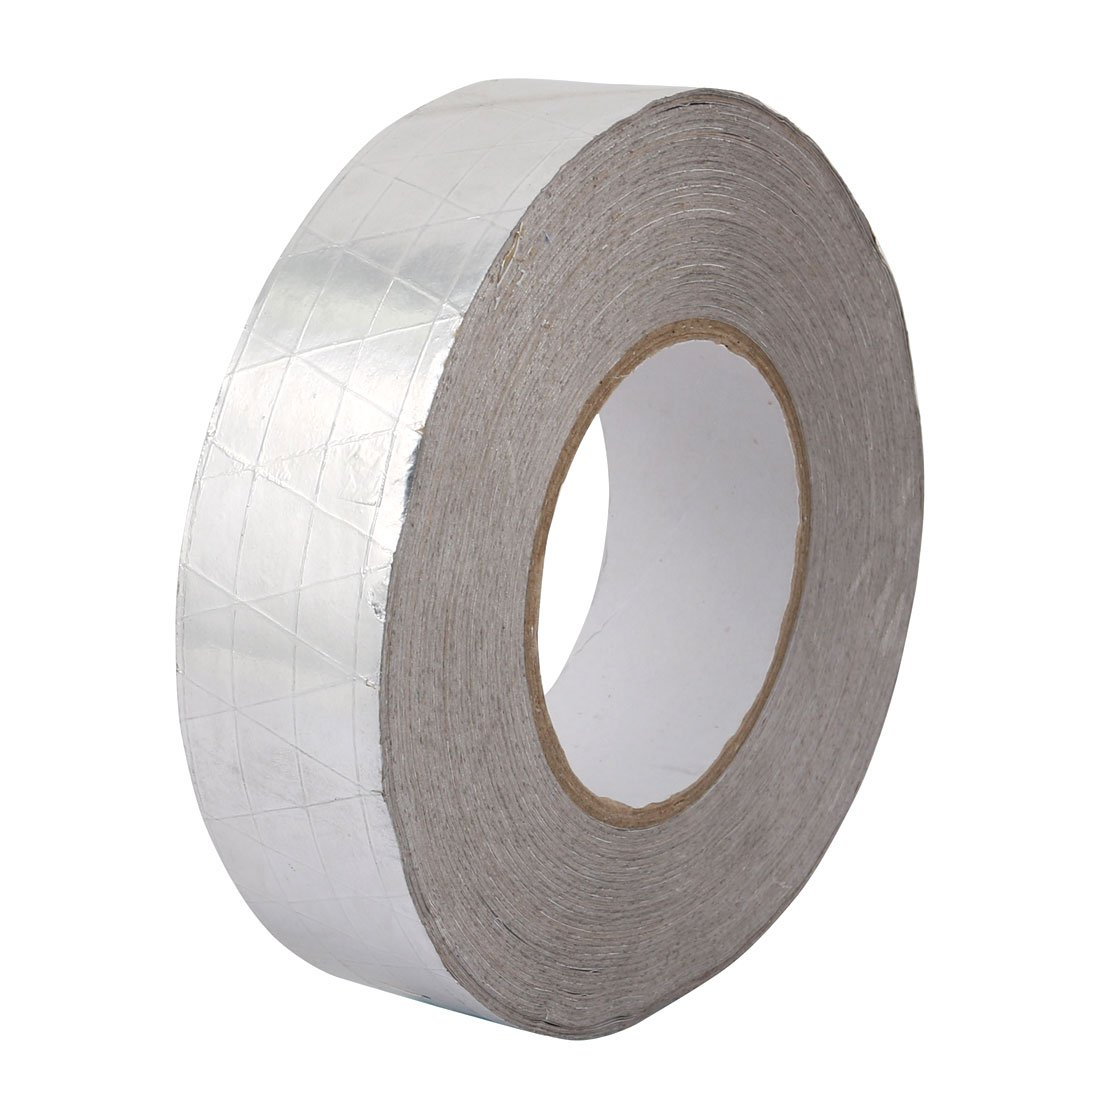 uxcell Aluminum Foil-Scrim-Kraft Insulation Jacketing Tape 50 Meter Length x 40mm Width